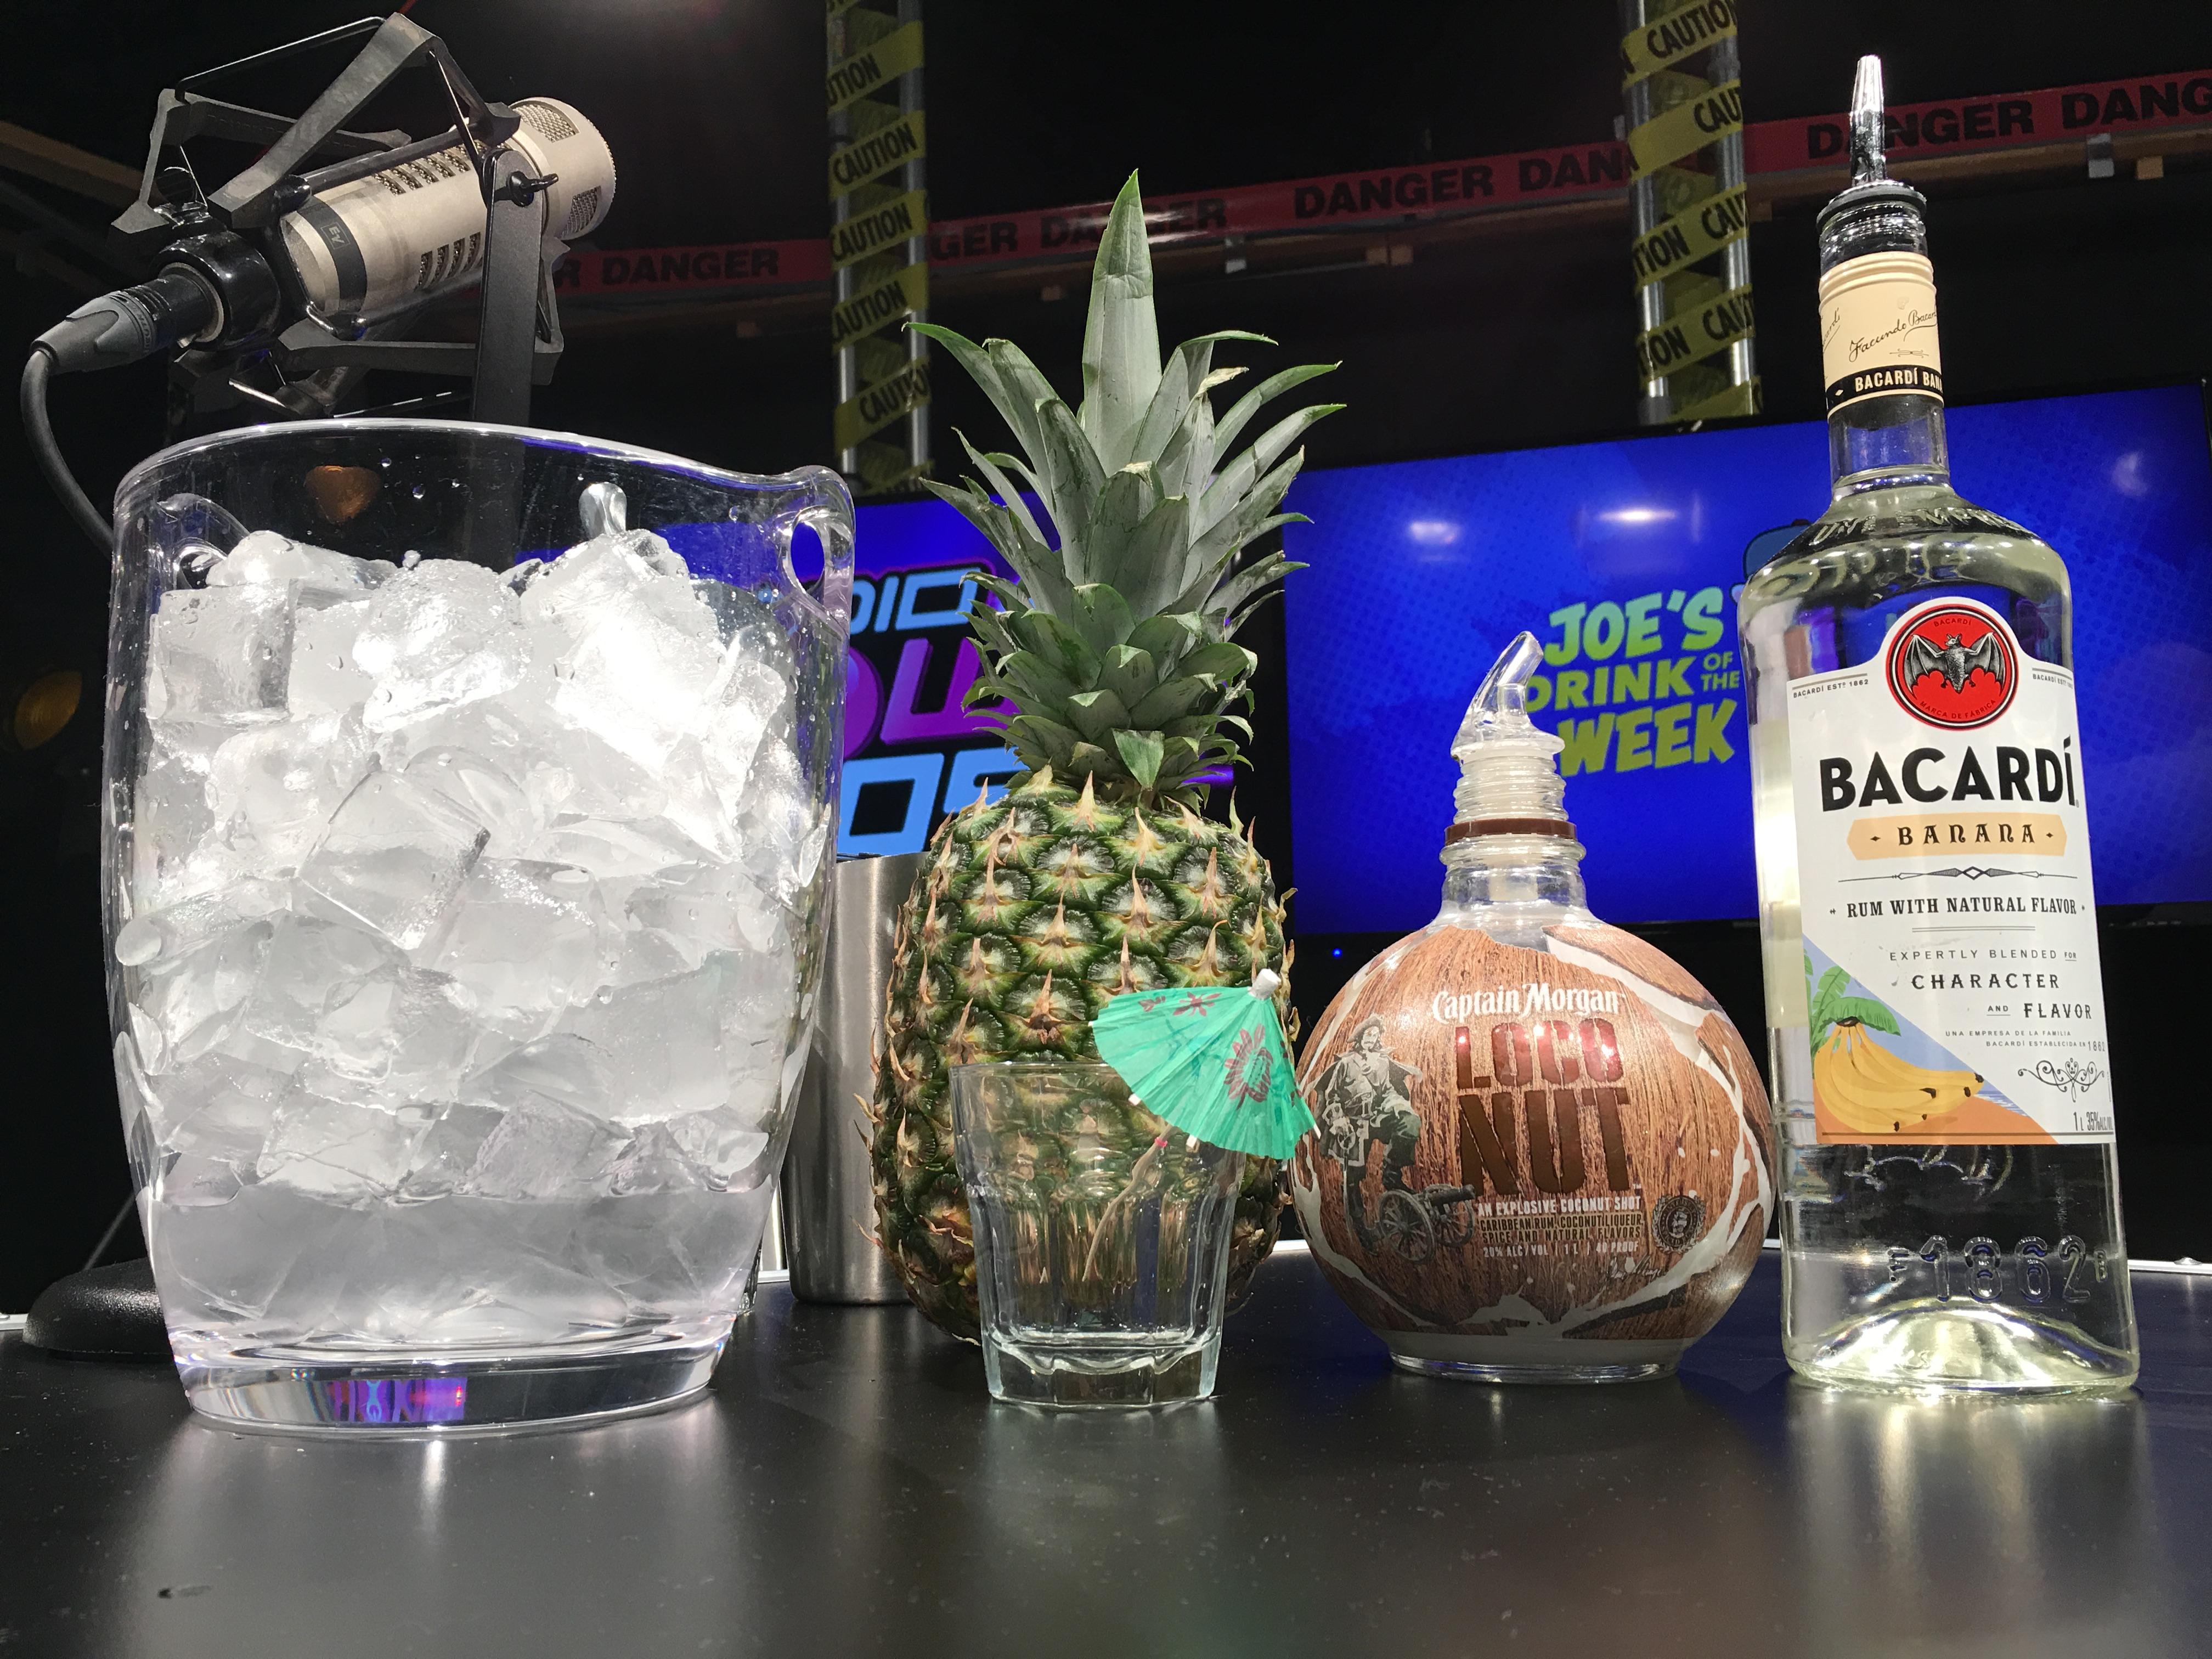 Joe's Drink of the Week: Coco Loca